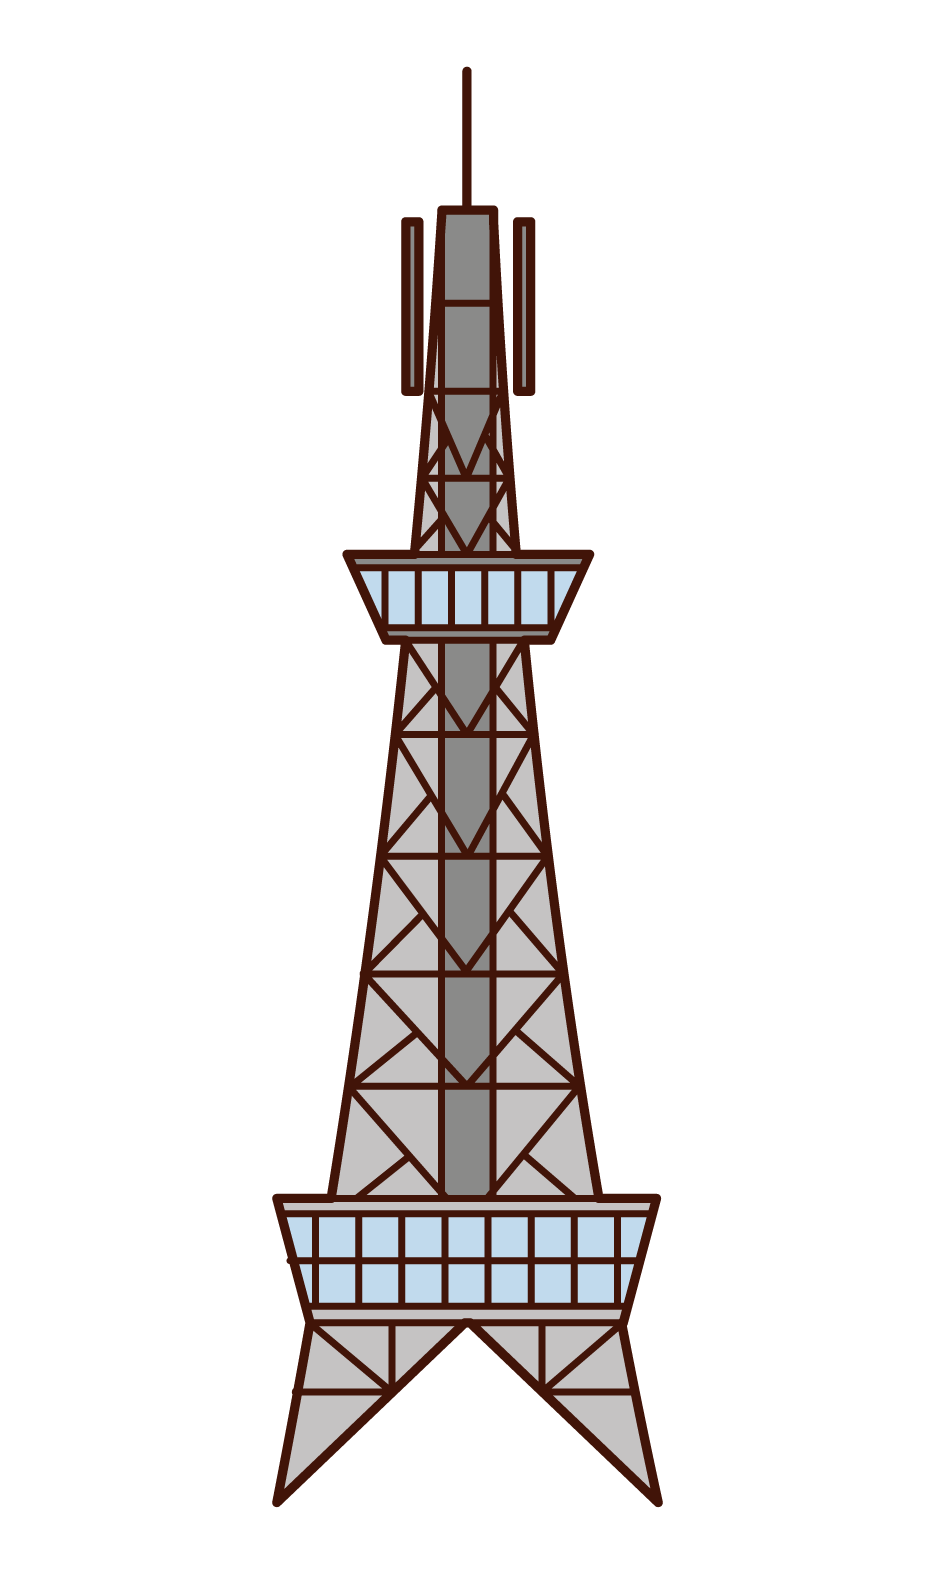 Illustration of Nagoya TV Tower